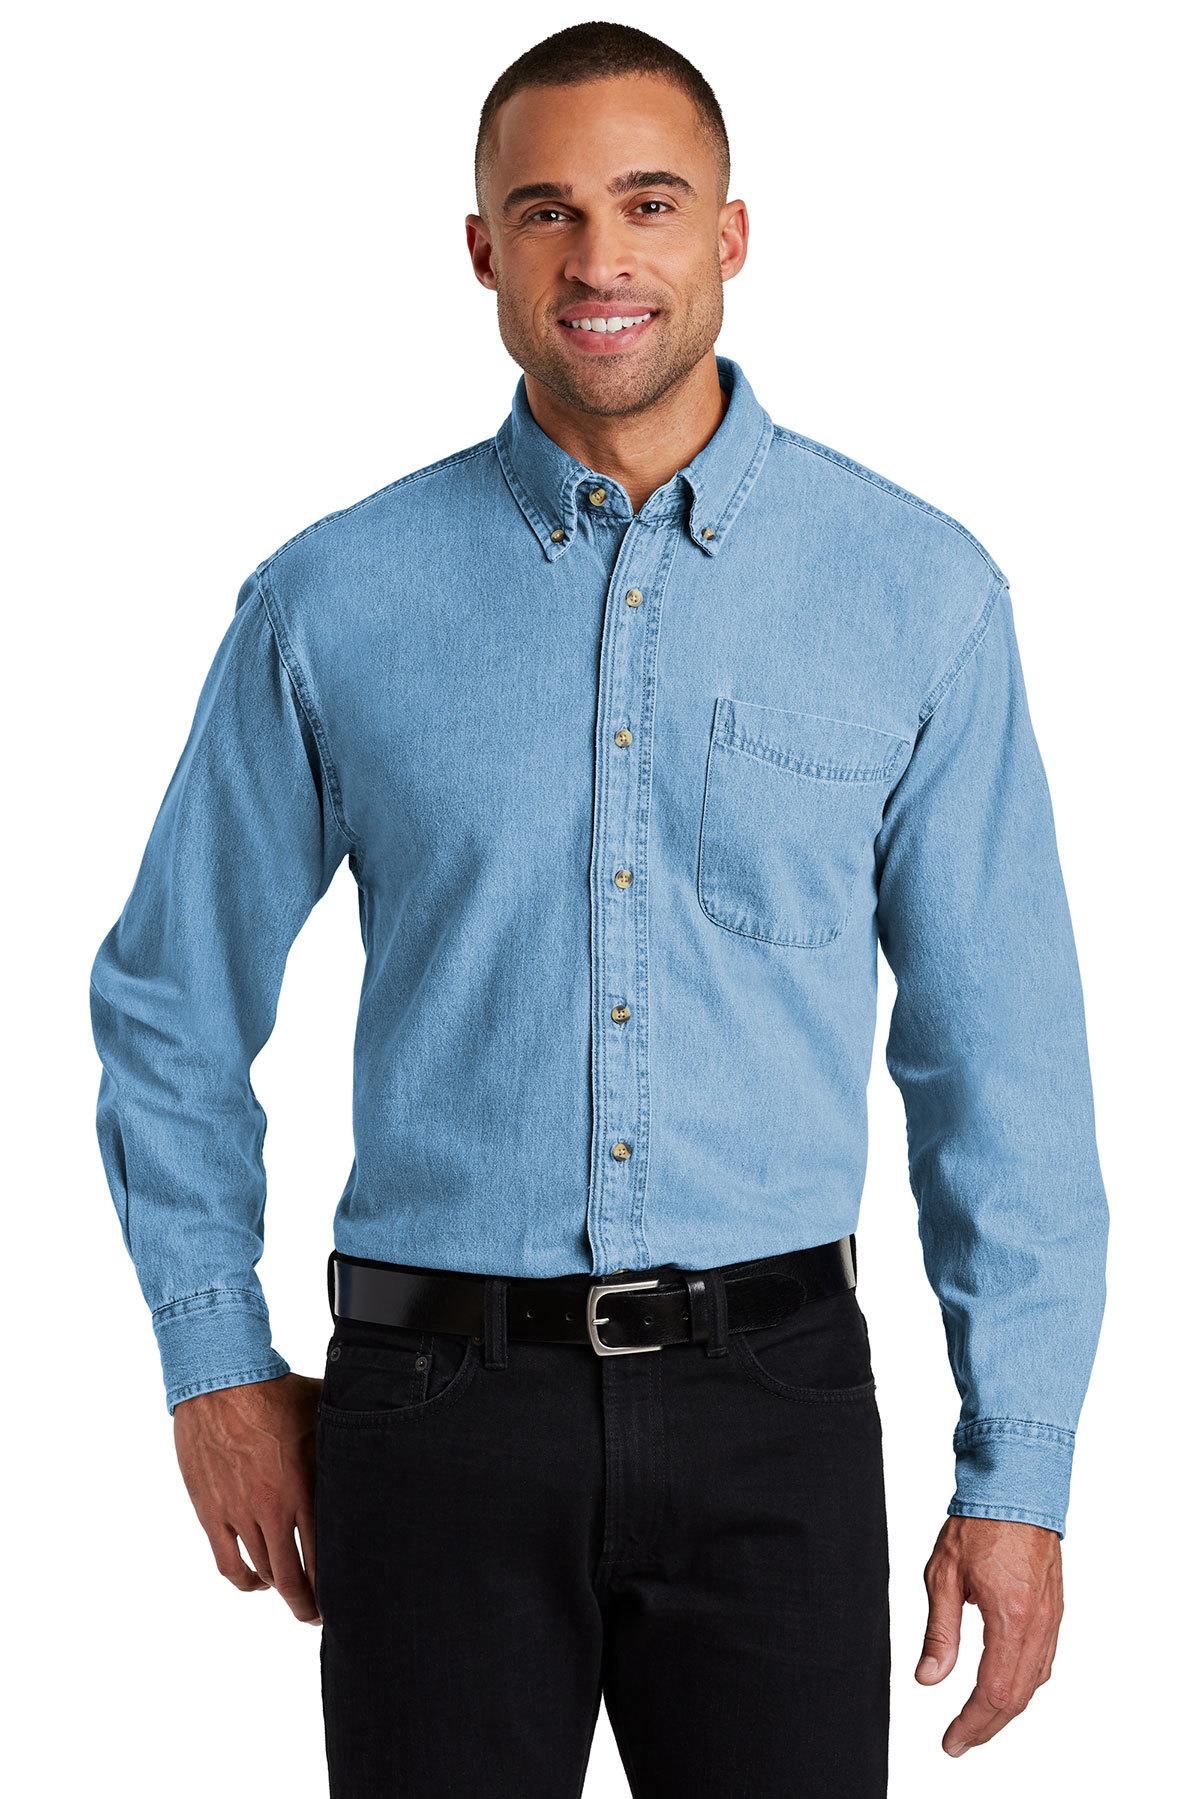 a8cad25b6f2 Port Authority® Long Sleeve Denim Shirt